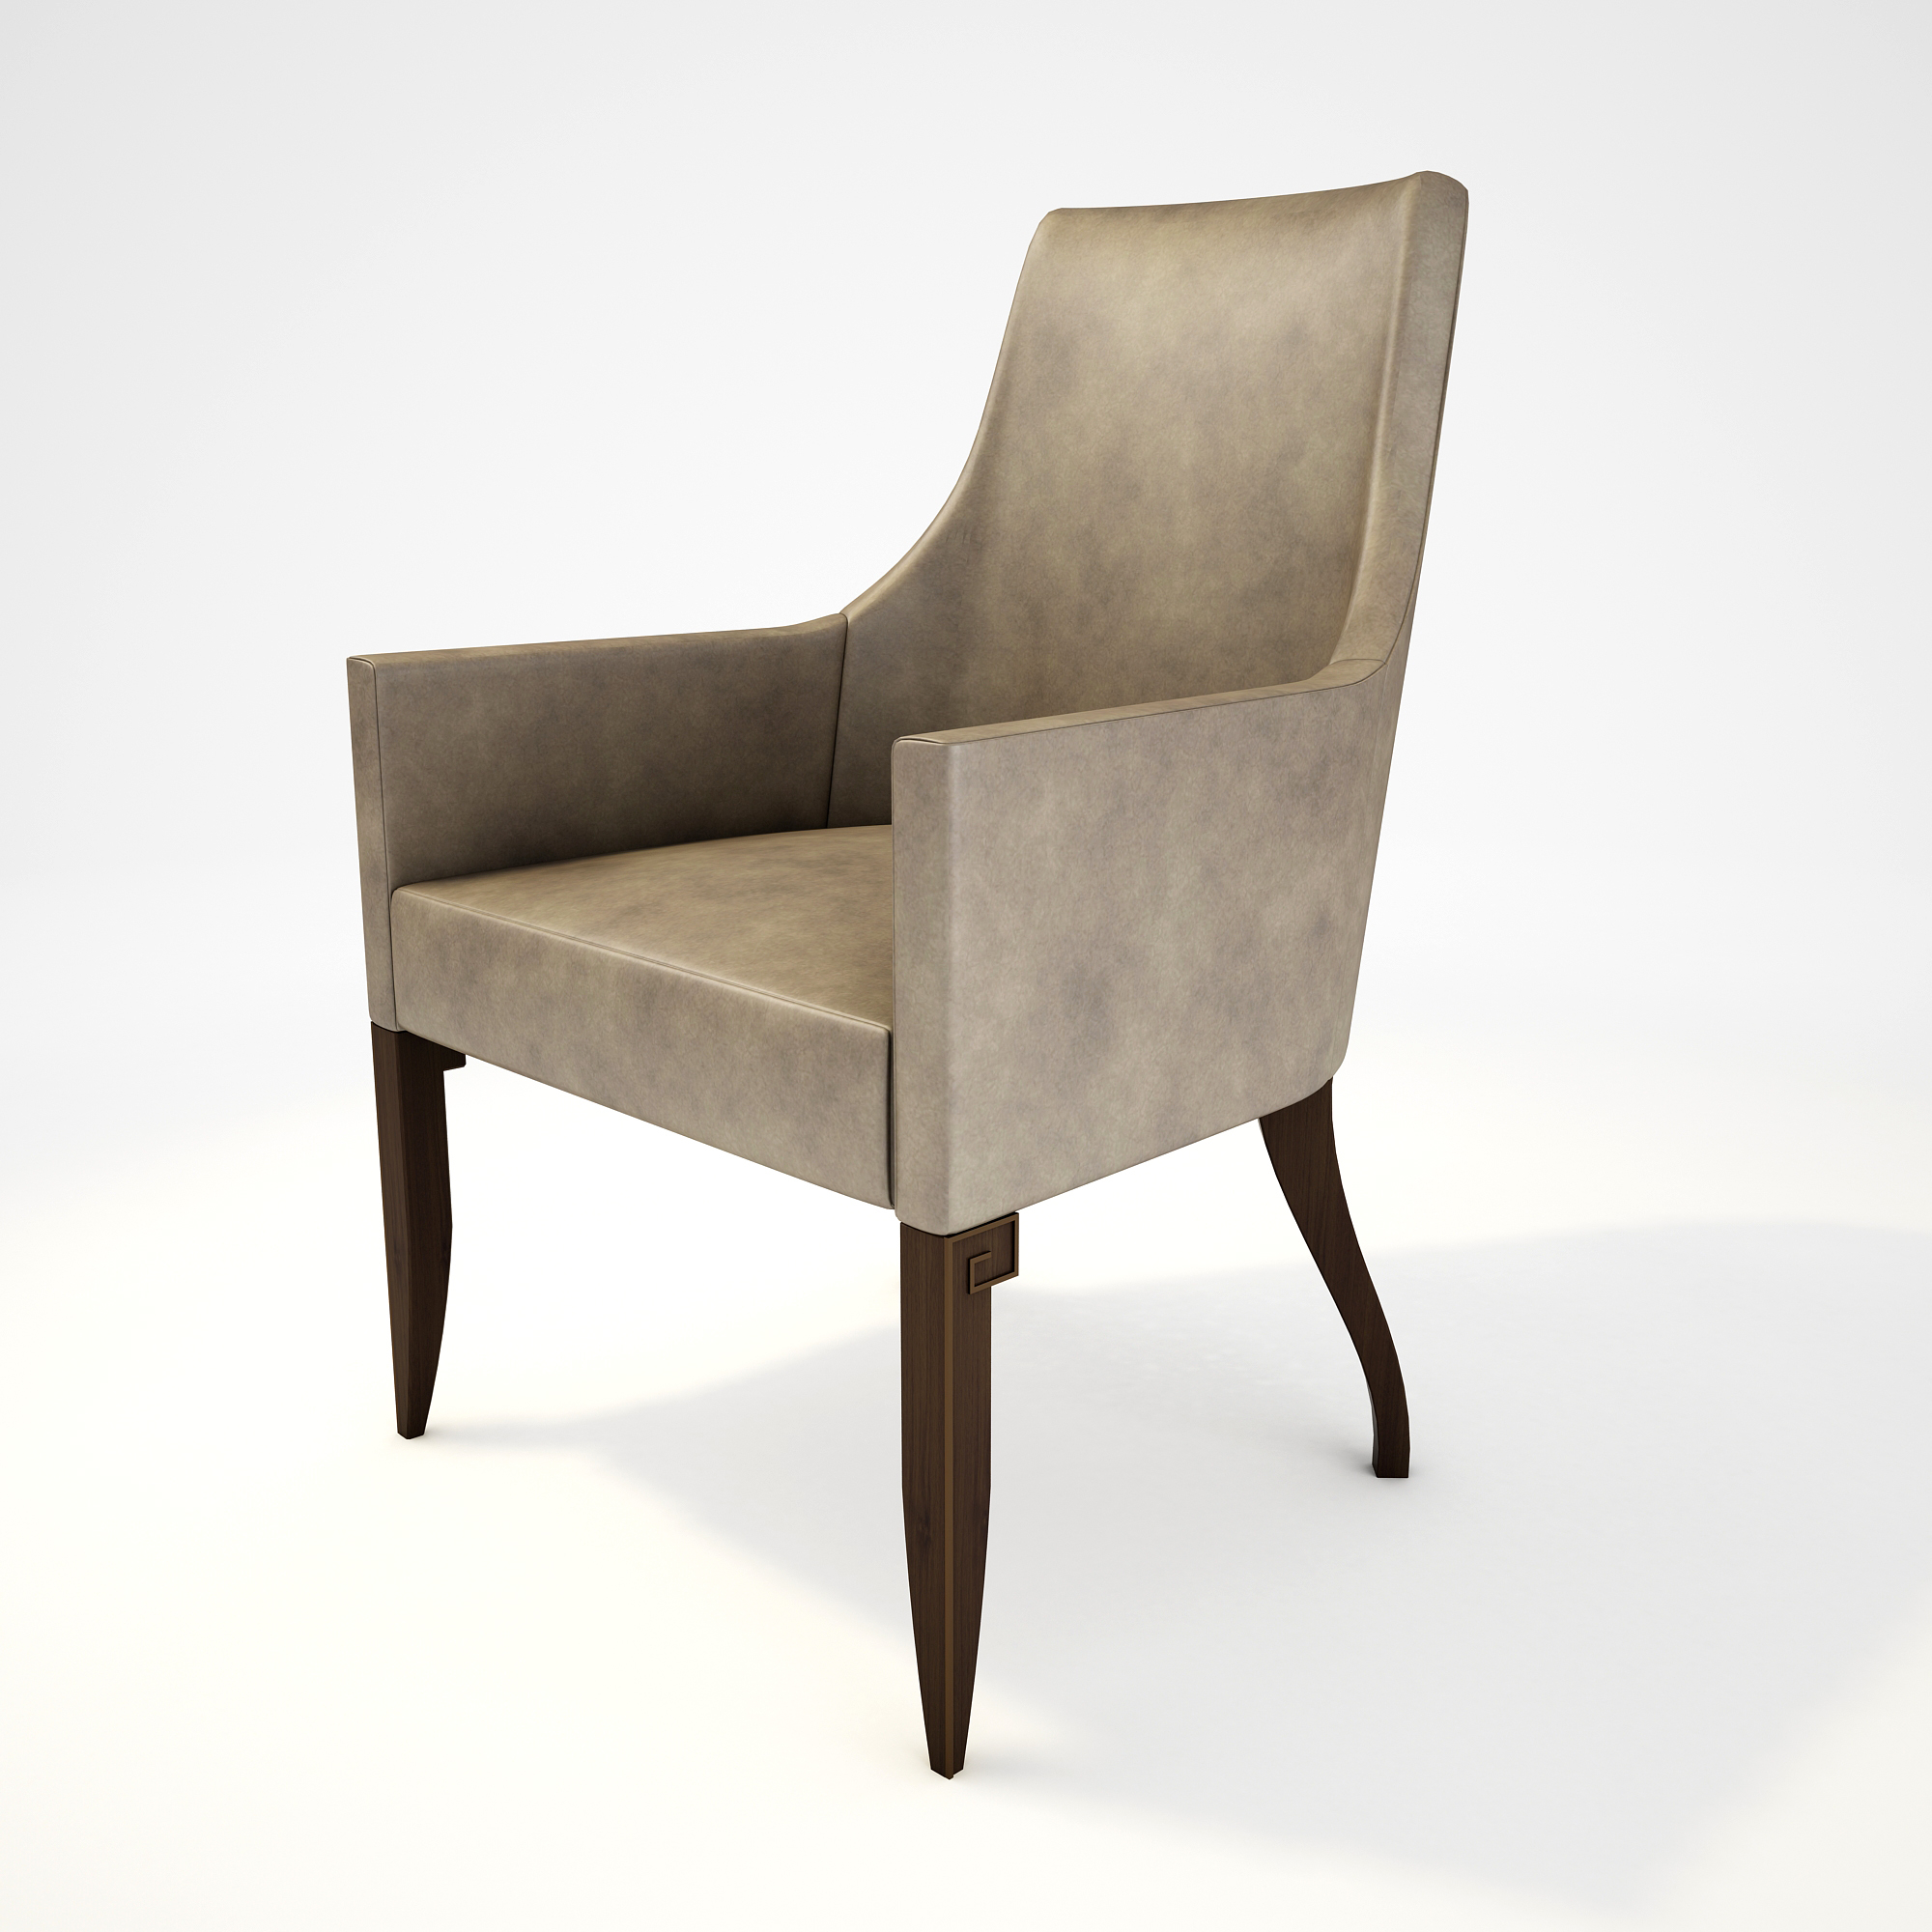 Wondrous Baker Thomas Pheasant Kallisto Dining Chair Evergreenethics Interior Chair Design Evergreenethicsorg